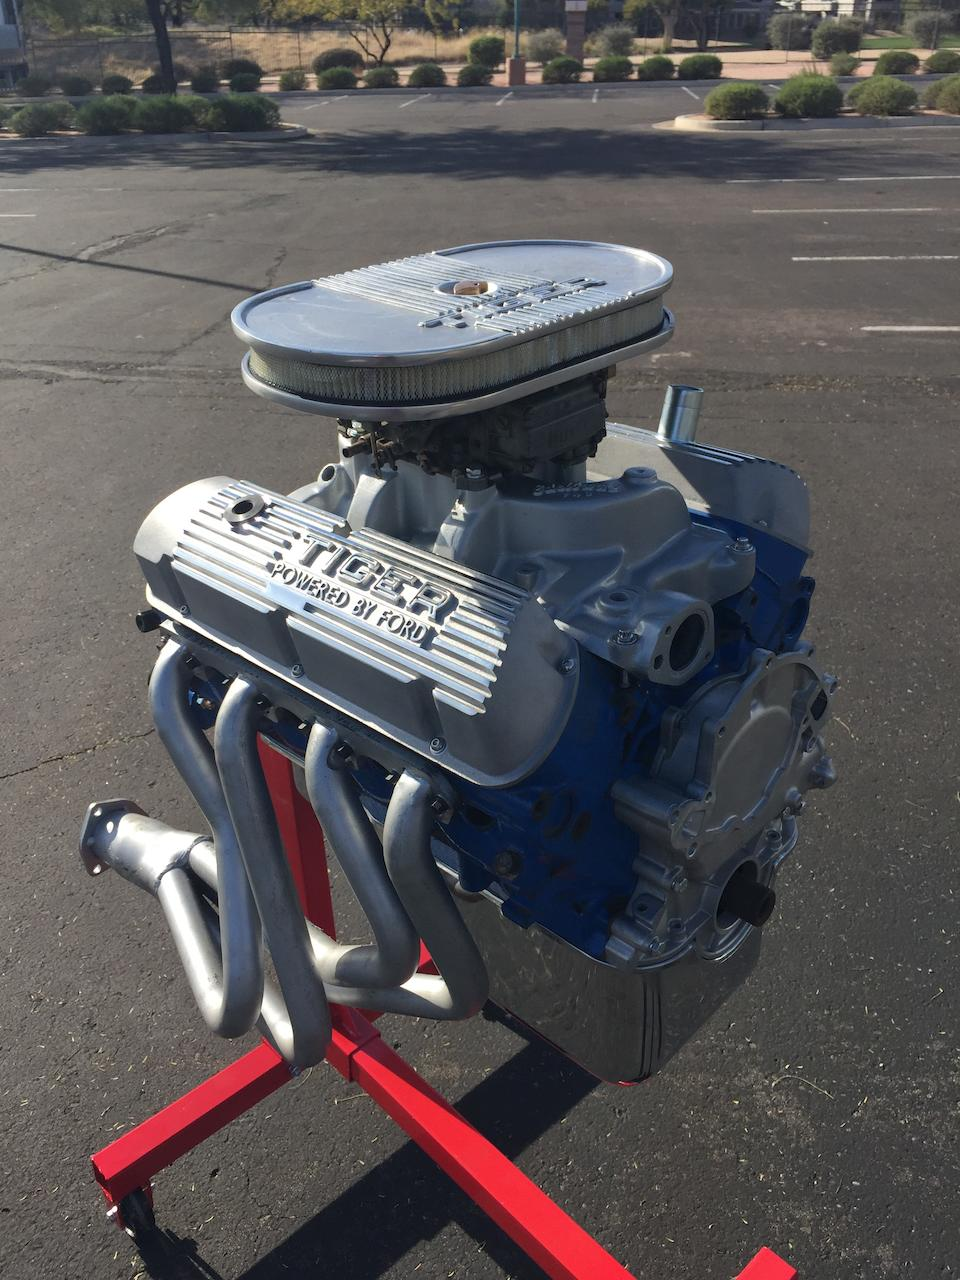 <b>1965 SUNBEAM TIGER Mk I</b><br />Chassis no. B9473614LRXFE<br />Engine no. 4624F21KA (see text)